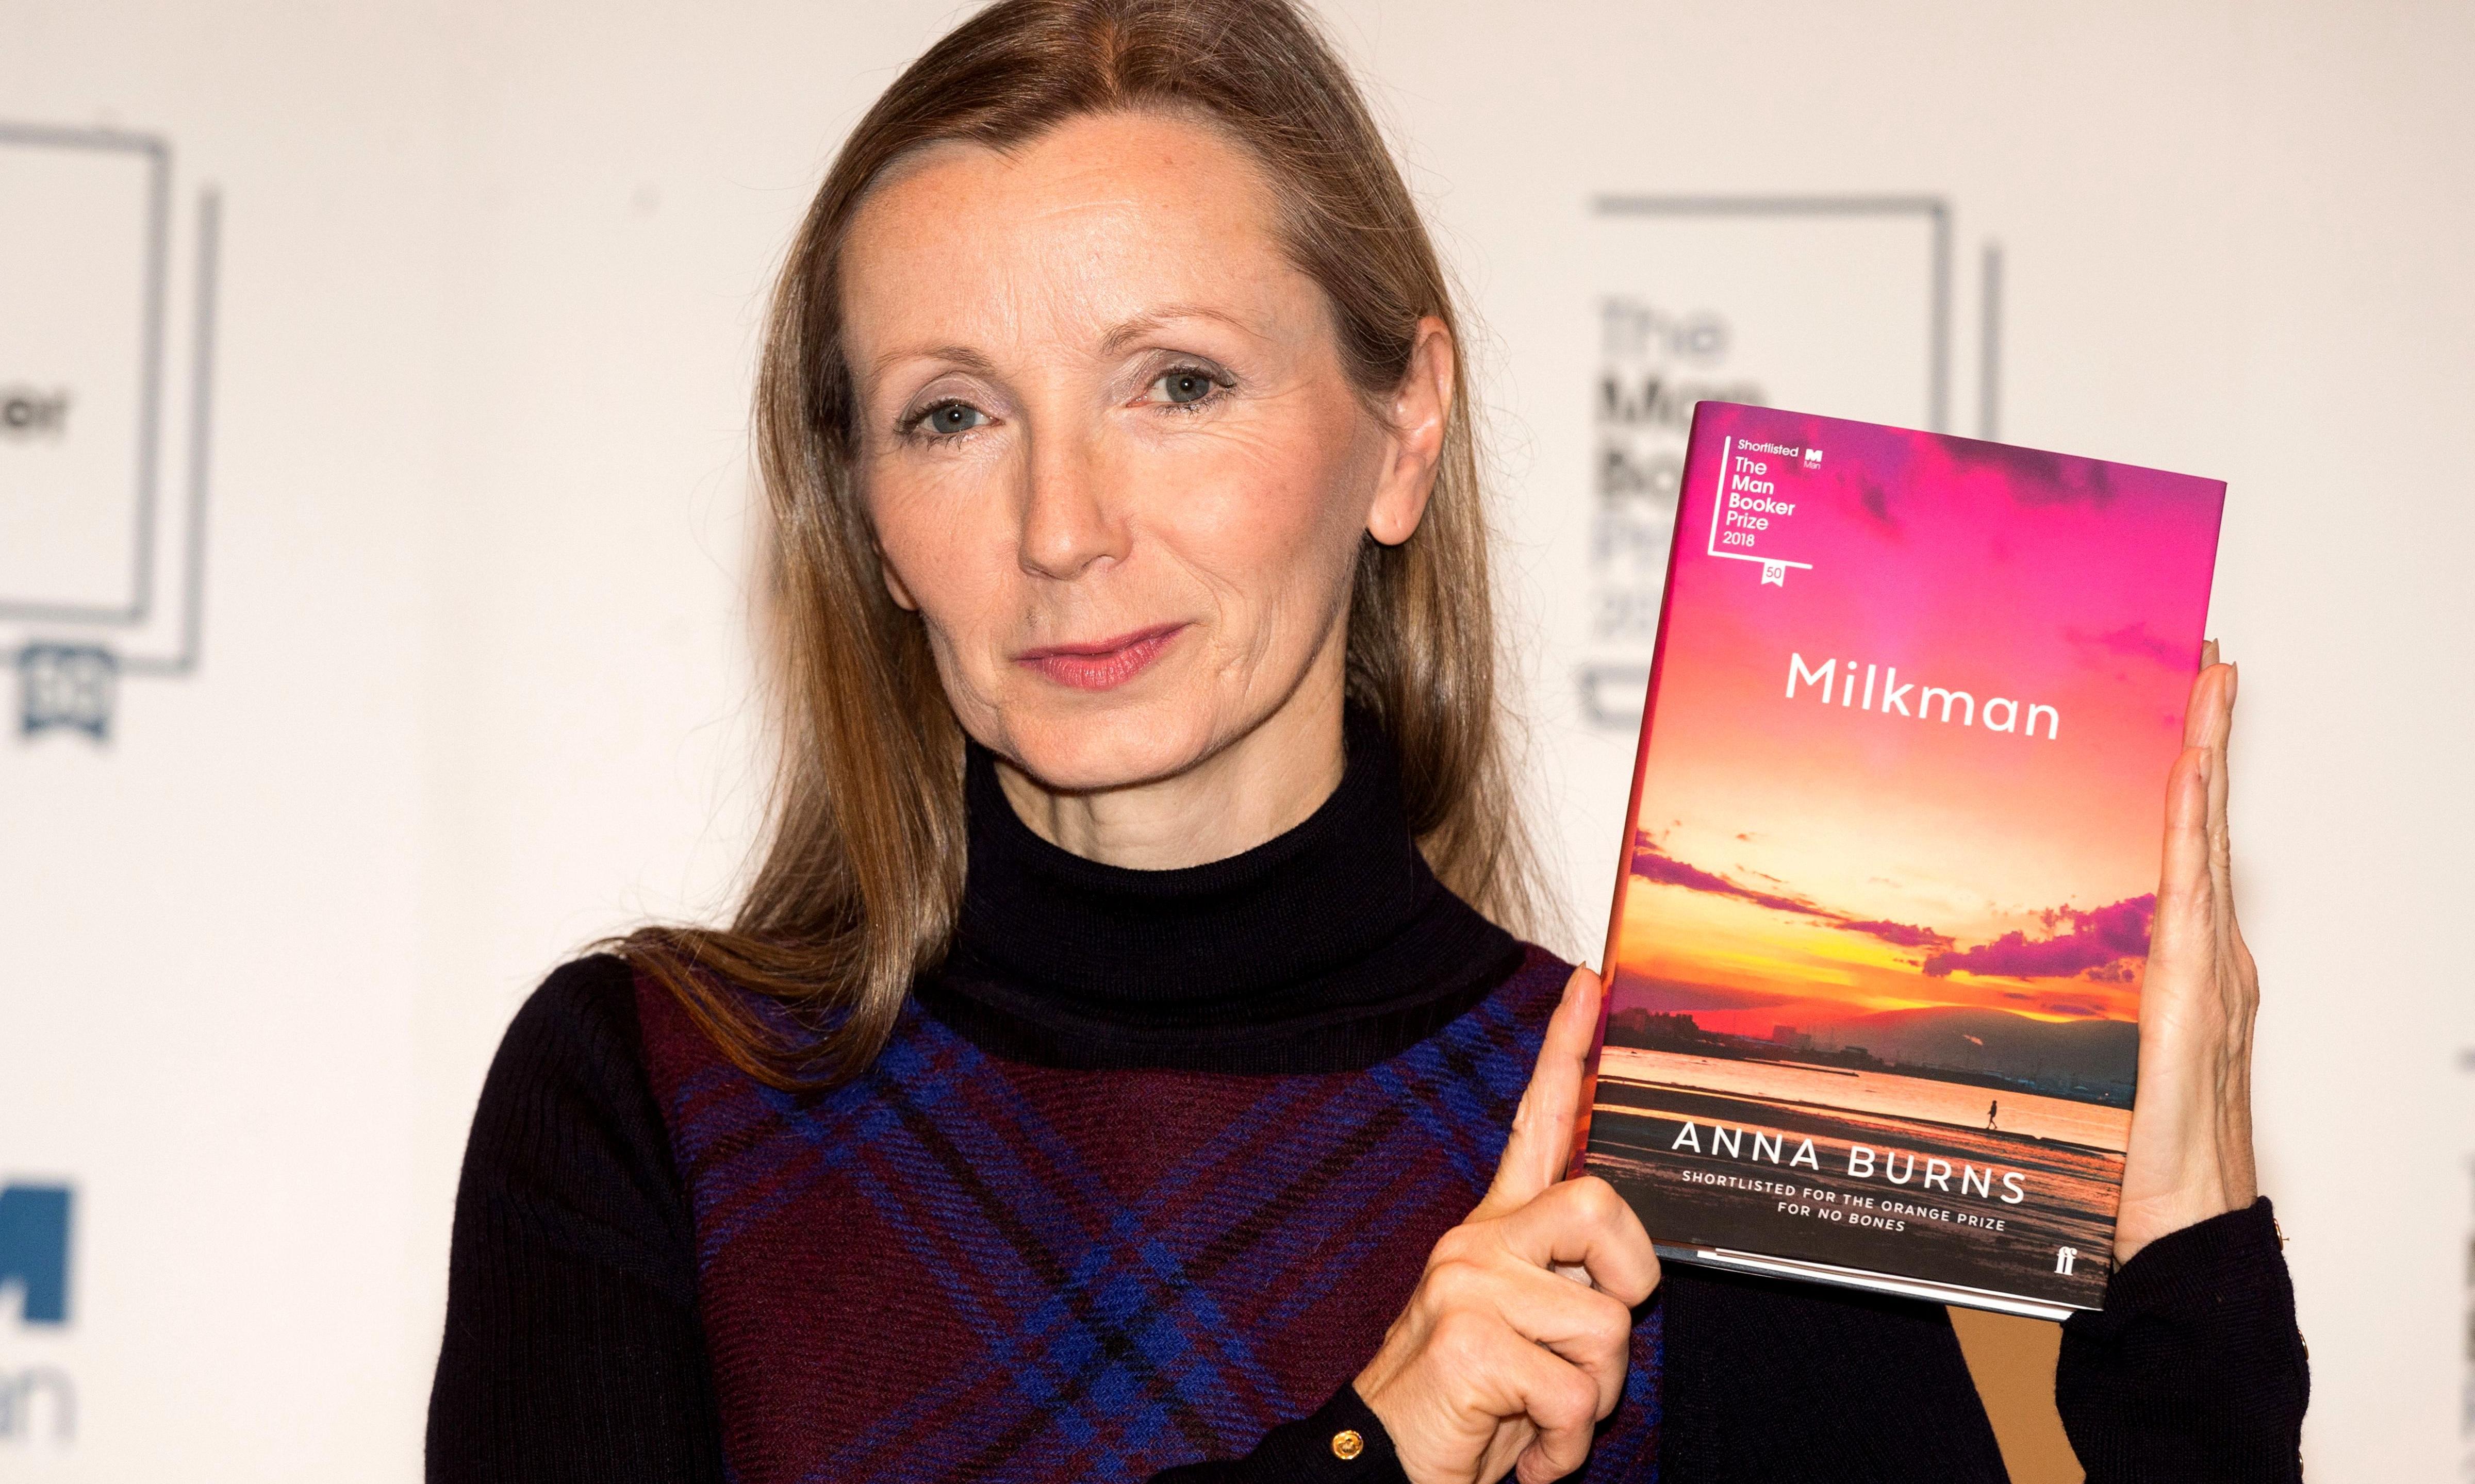 Anna Burns and Sally Rooney on Rathbones Folio prize longlist